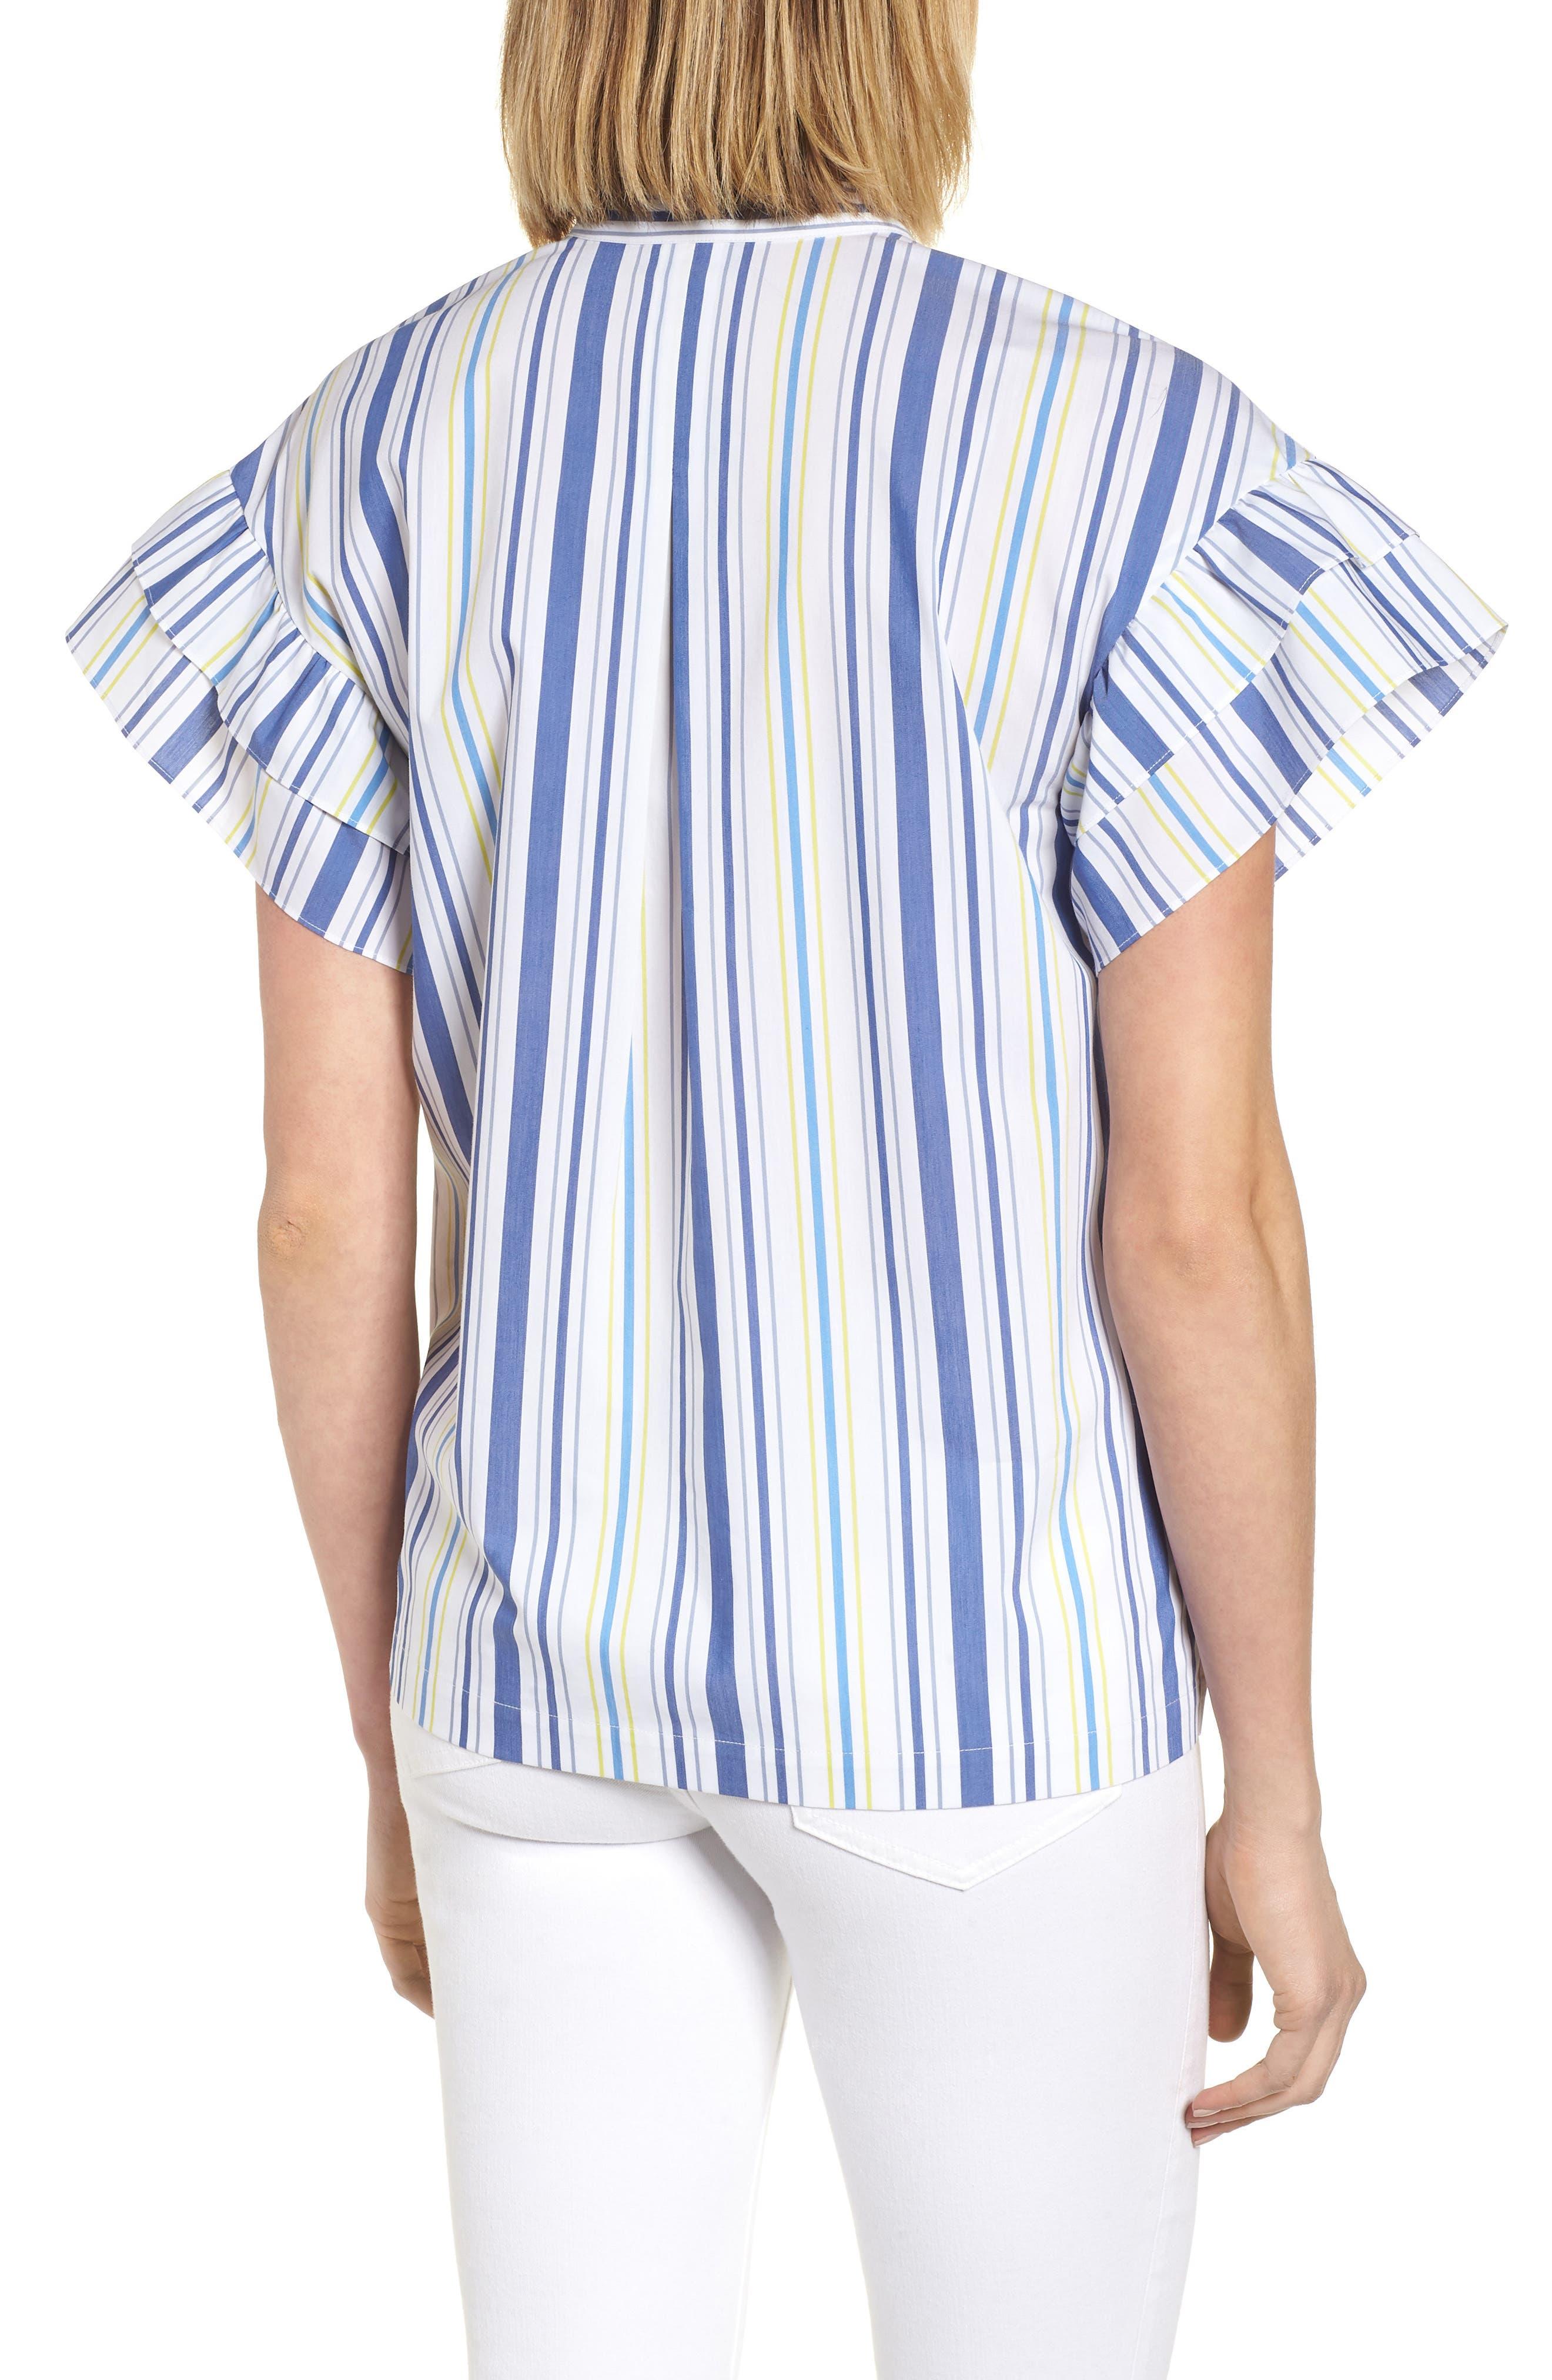 Ruffle Sleeve Stretch Cotton Blend Blouse,                             Alternate thumbnail 2, color,                             White Multi Stripe